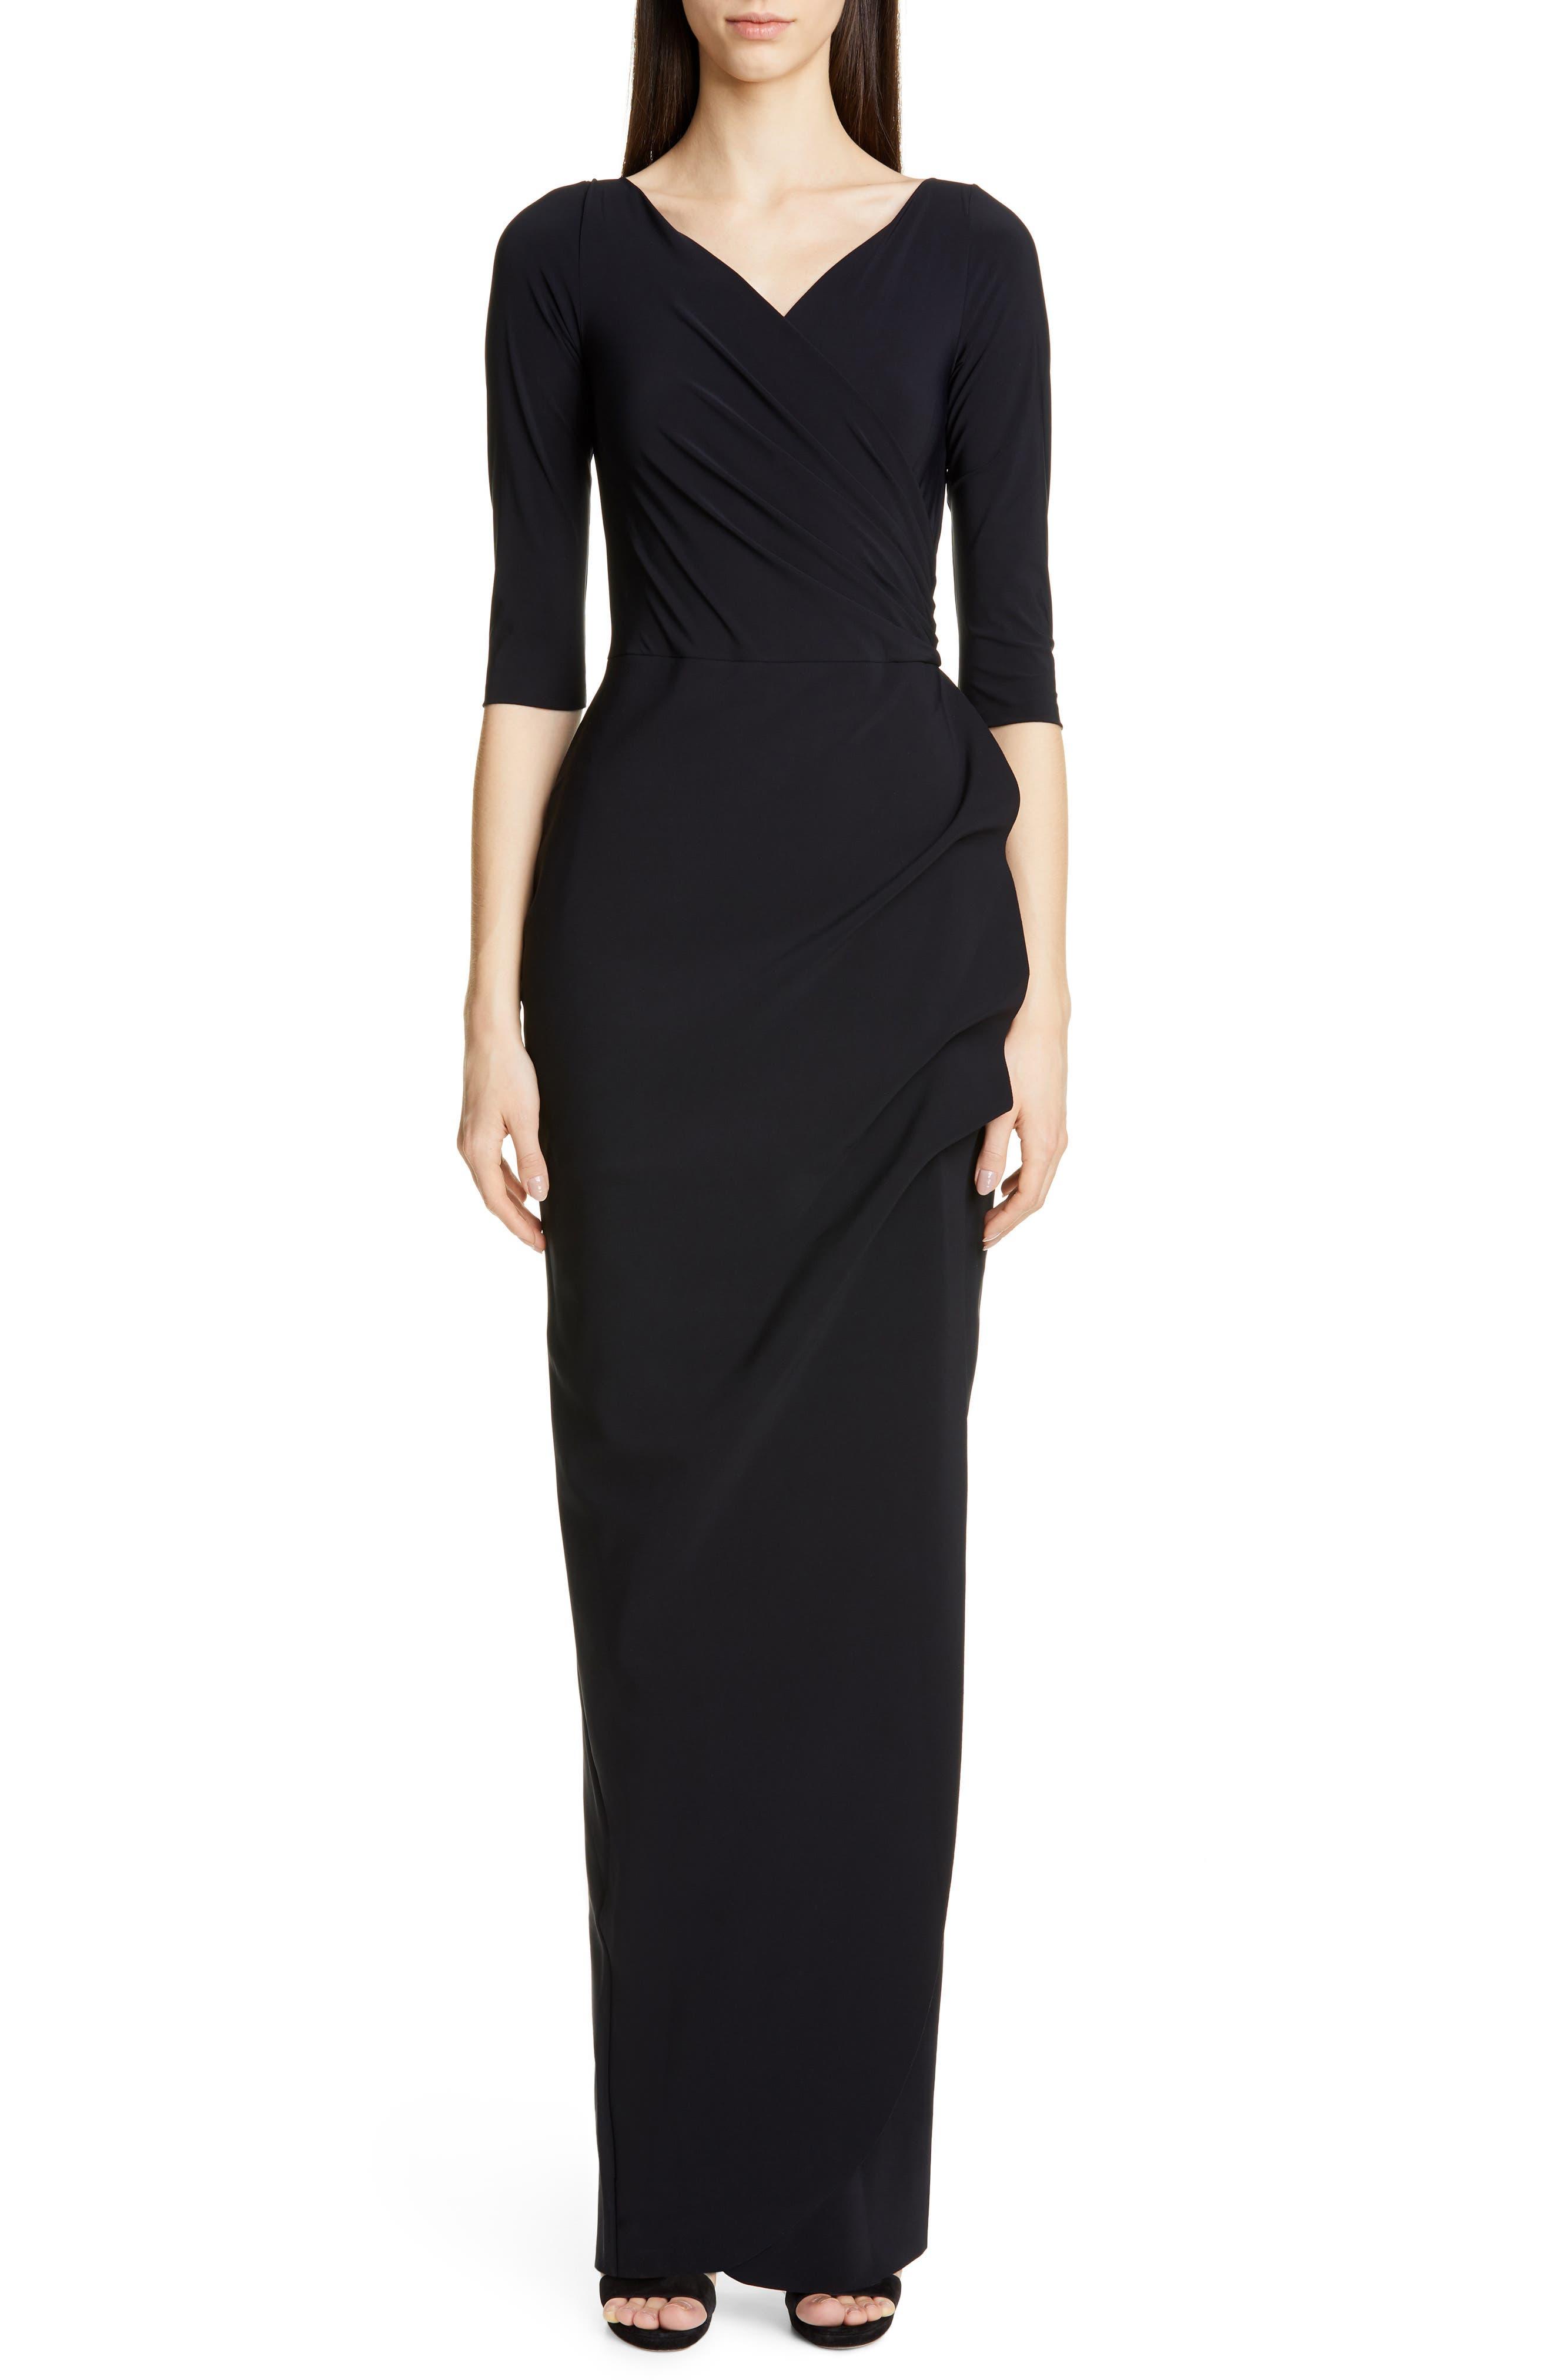 Chiara Boni La Petite Robe Florien Ruched Evening Dress, 8 US / 54 IT - Black